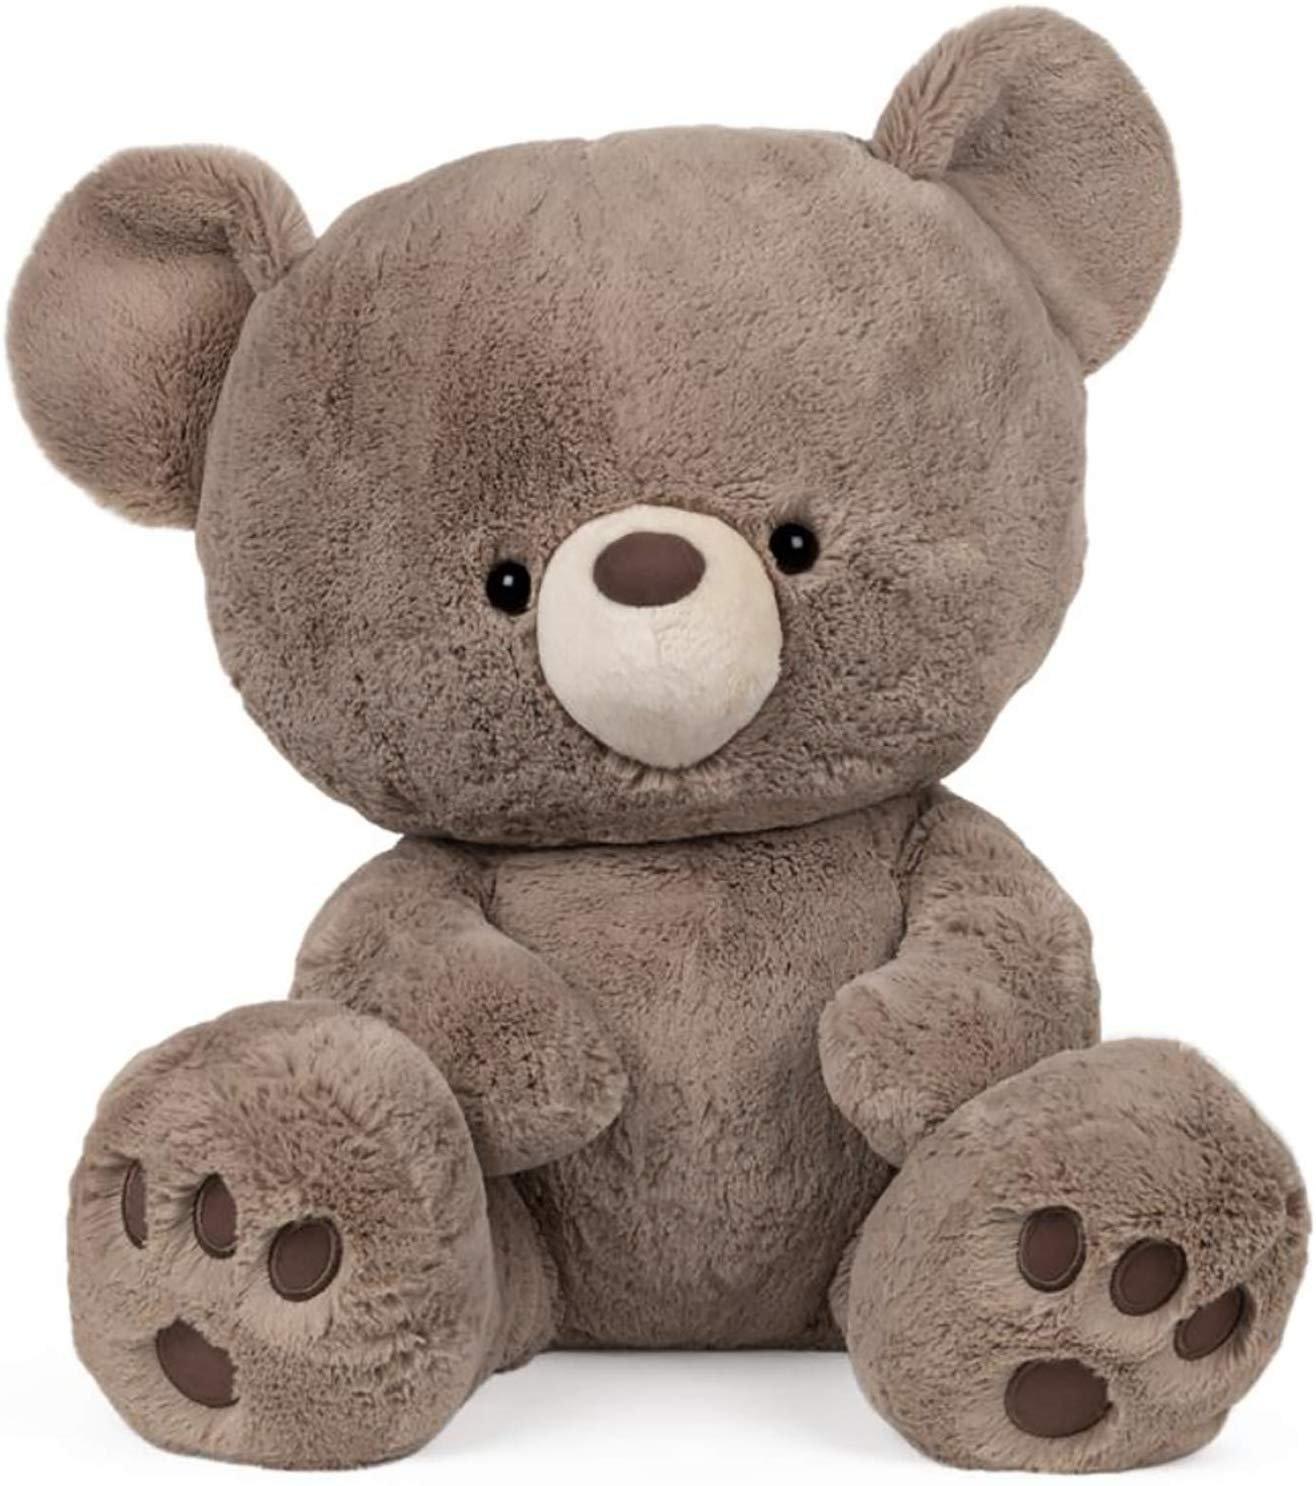 Gund Kai Taupe Teddy Bear 23 in